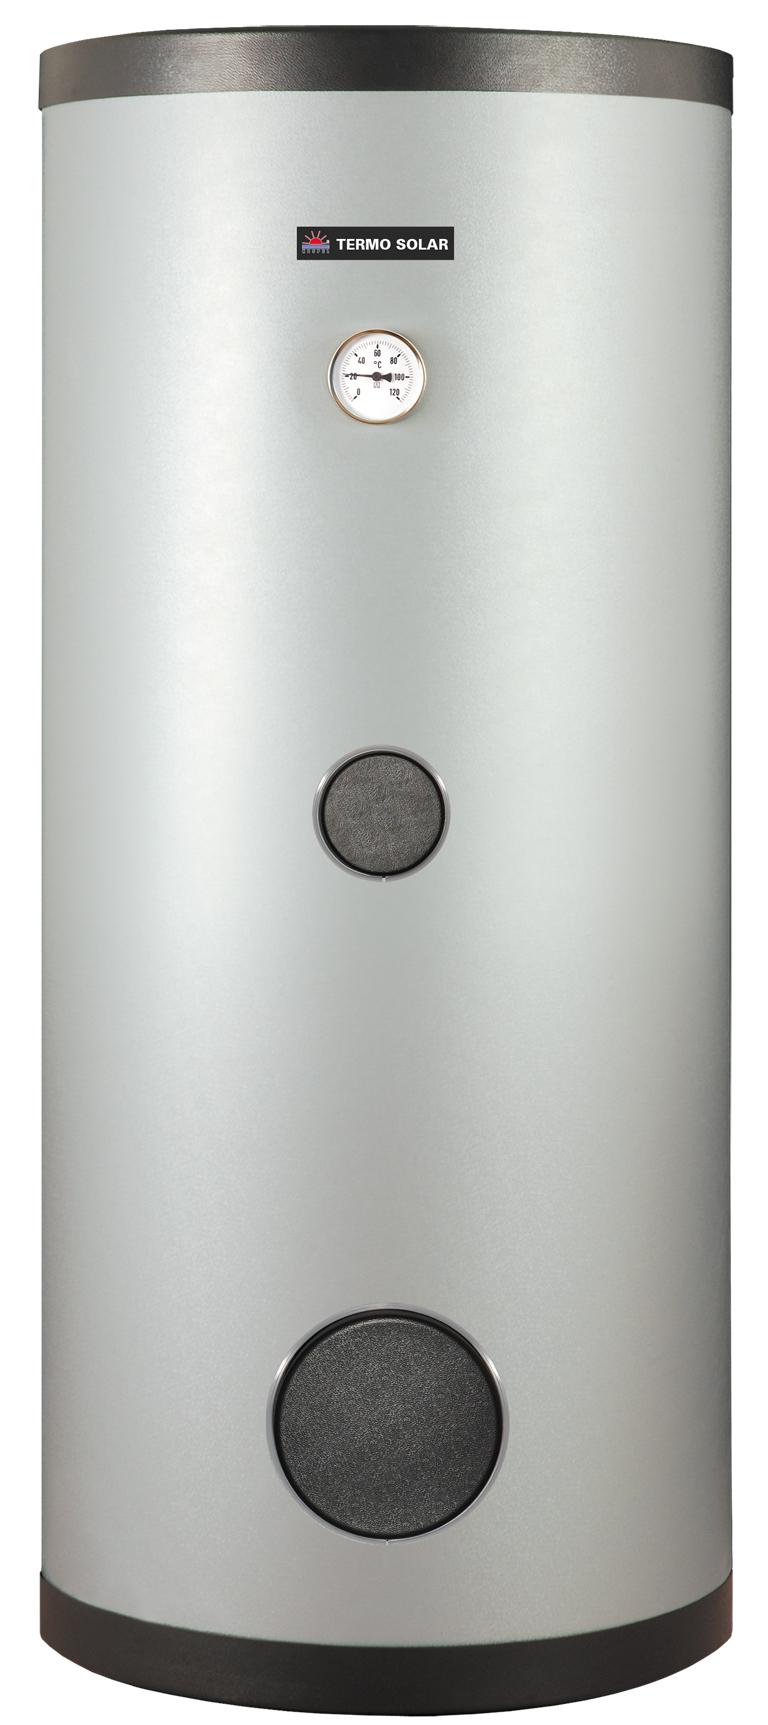 Kospel Solarspeicher SB - 250 Termo Solar 201417